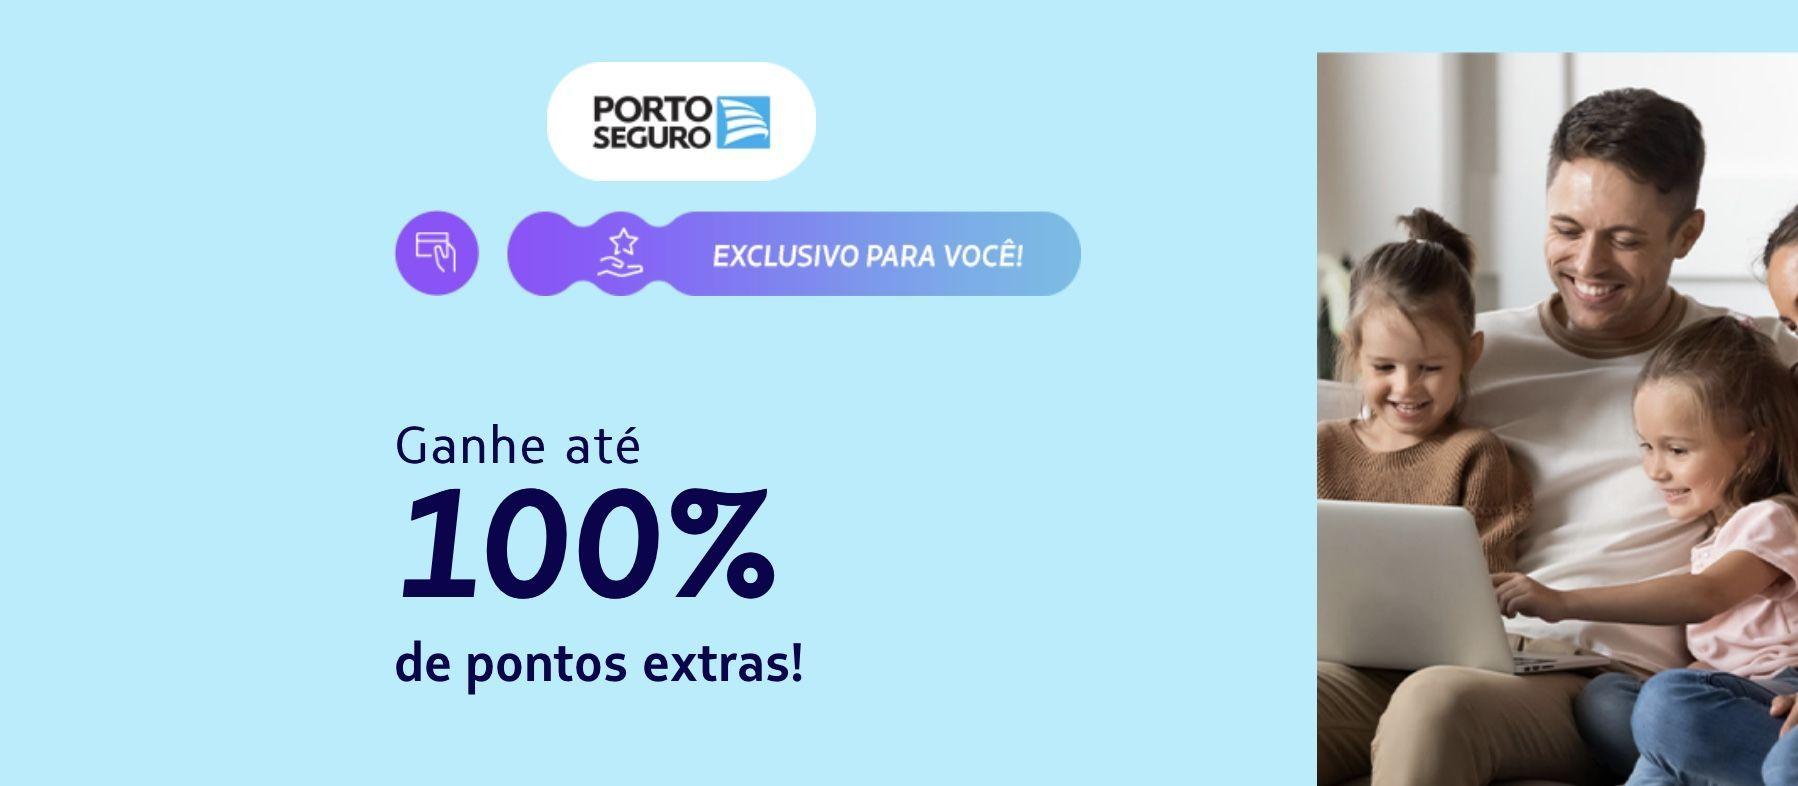 LATAM bônus 100% porto